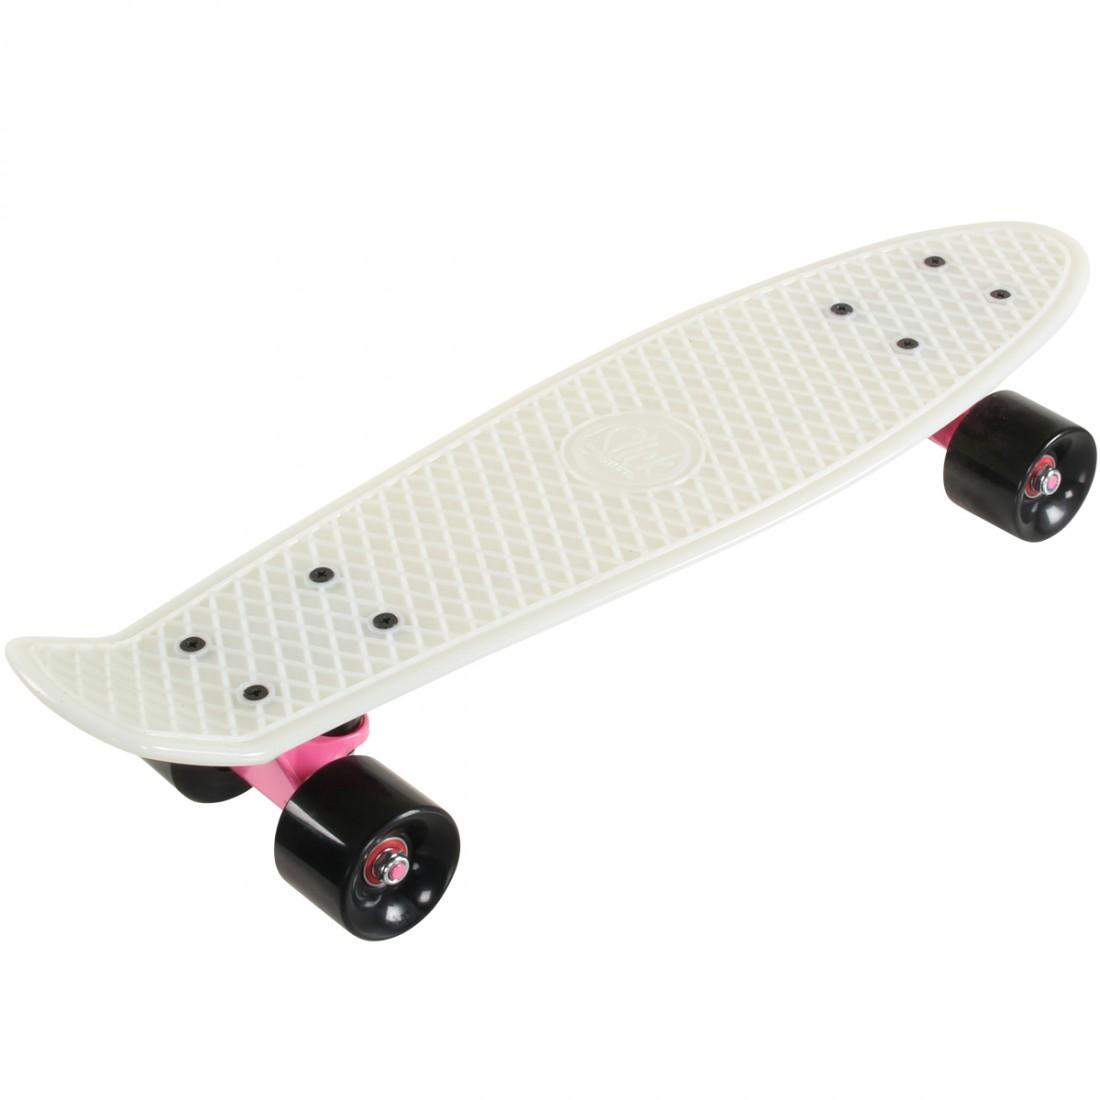 slick mini cruiser skateboard glow in the dark fahrrad ausverkauf. Black Bedroom Furniture Sets. Home Design Ideas